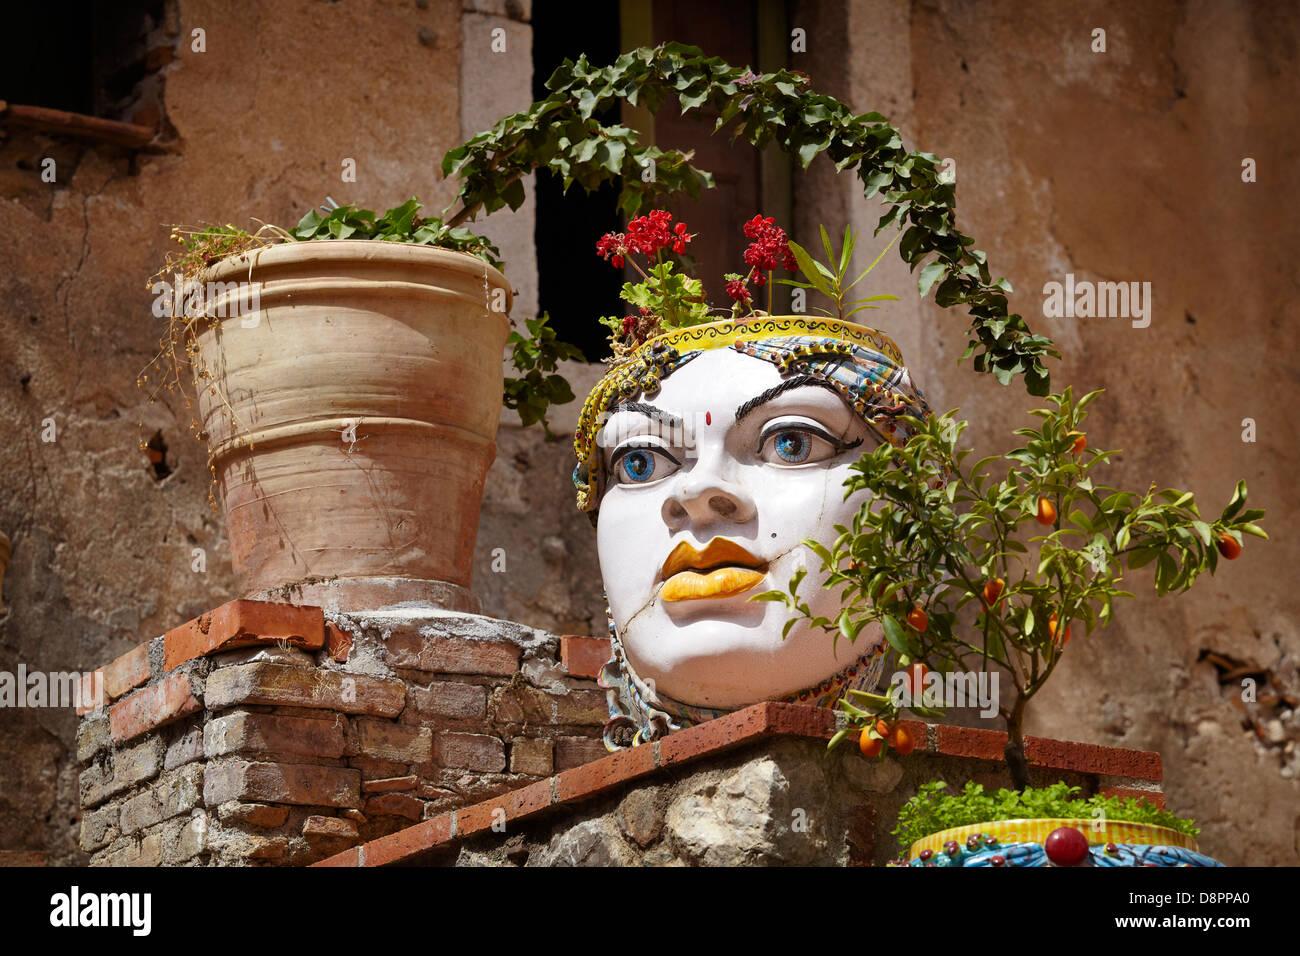 Sizilianische Keramik Kunst Dekoration, Altstadt in Taormina, Sizilien, Italien Stockbild